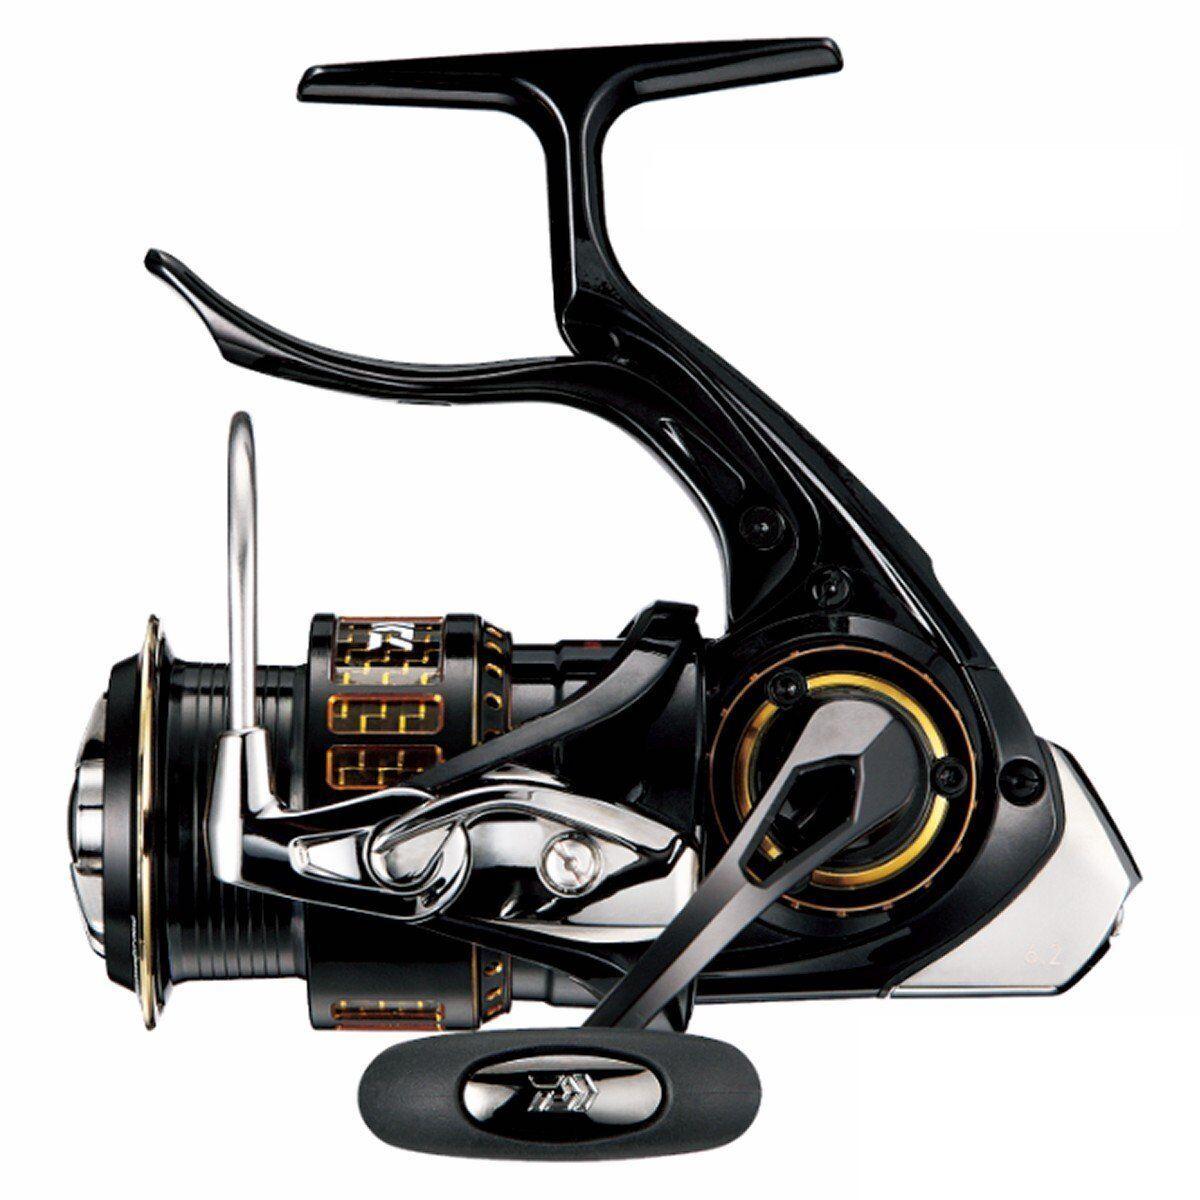 Daiwa MORETHAN 17-LBD 2510PE Sea bass Fishing REEL From JAPAN